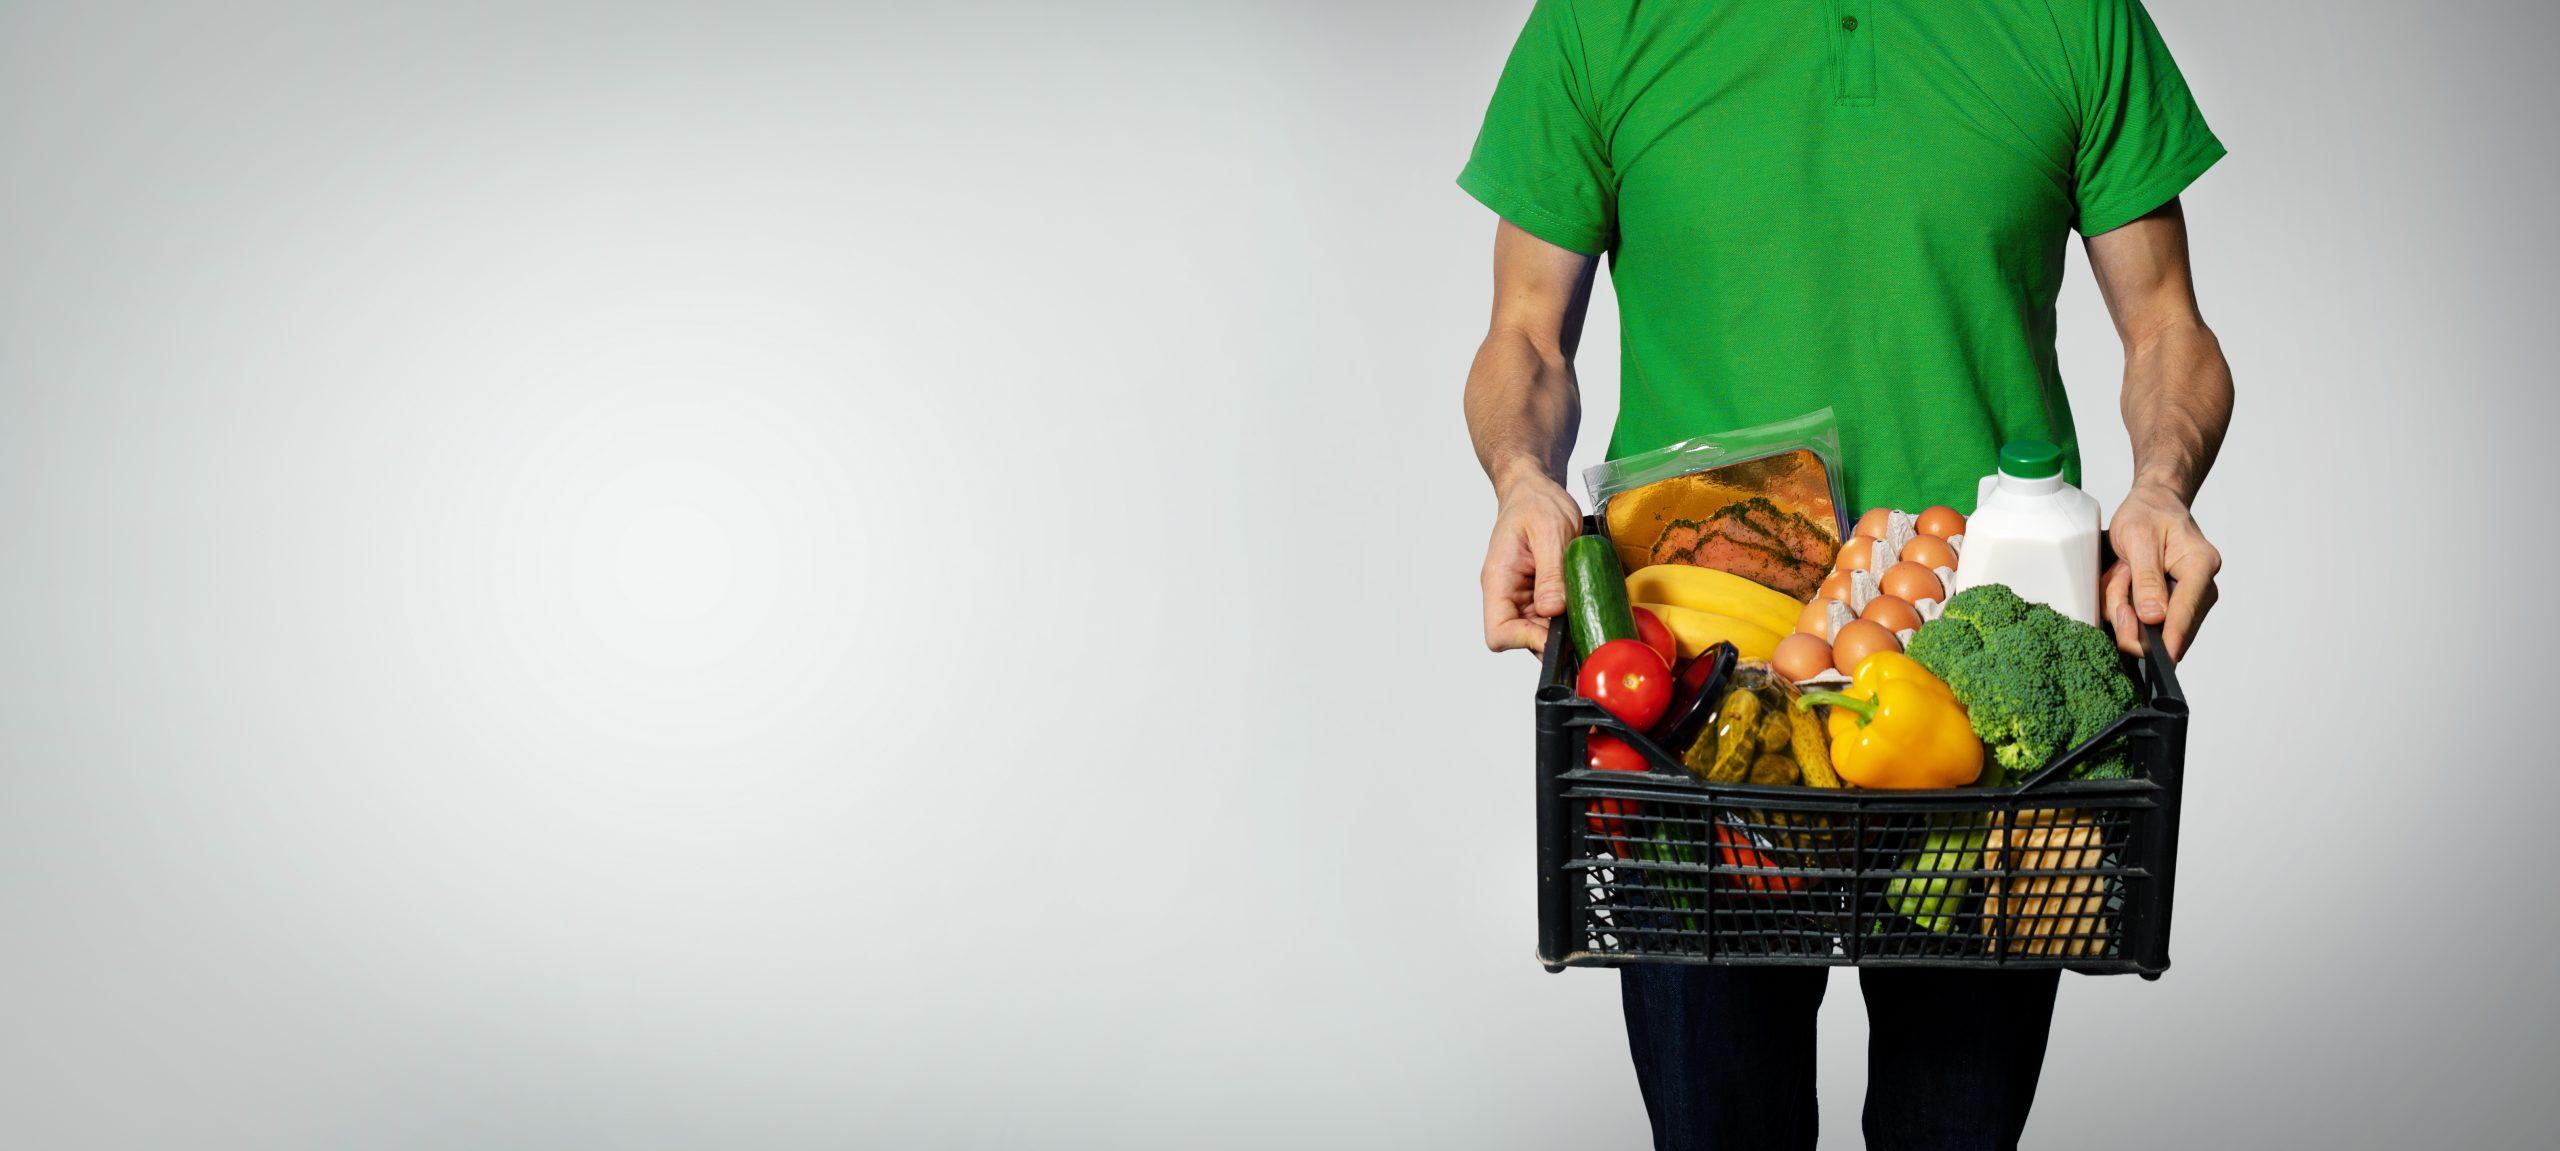 Are you a Full-Service Instacart Shopper?